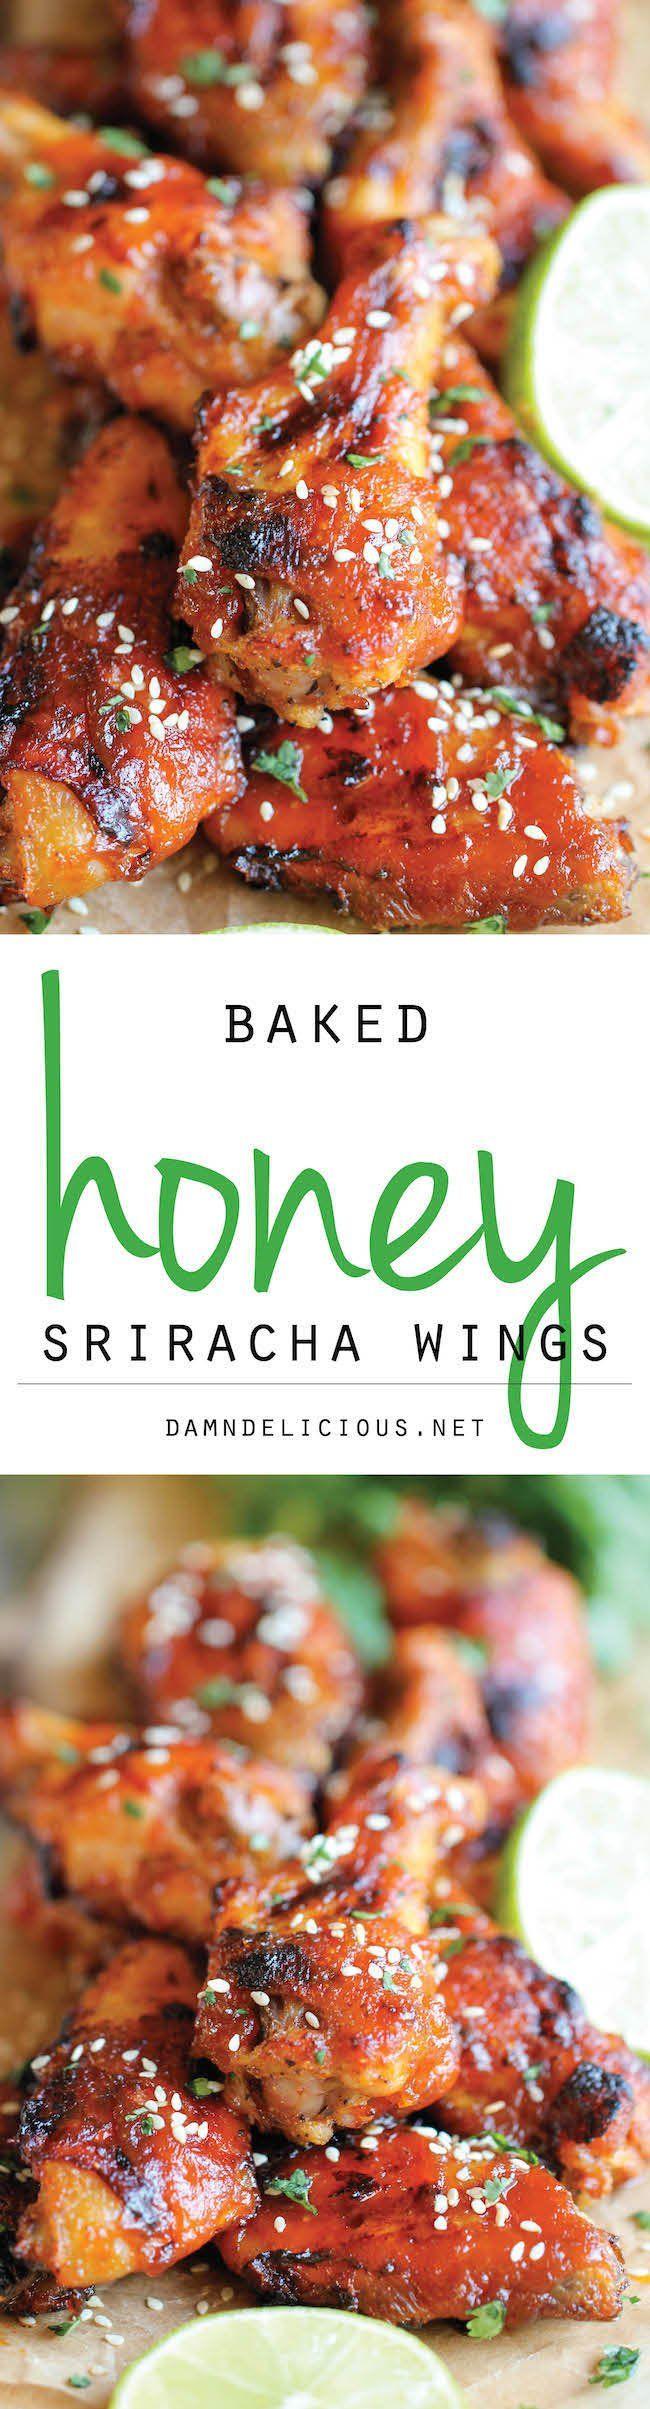 Baked Honey Sriracha Wings FoodBlogs.com